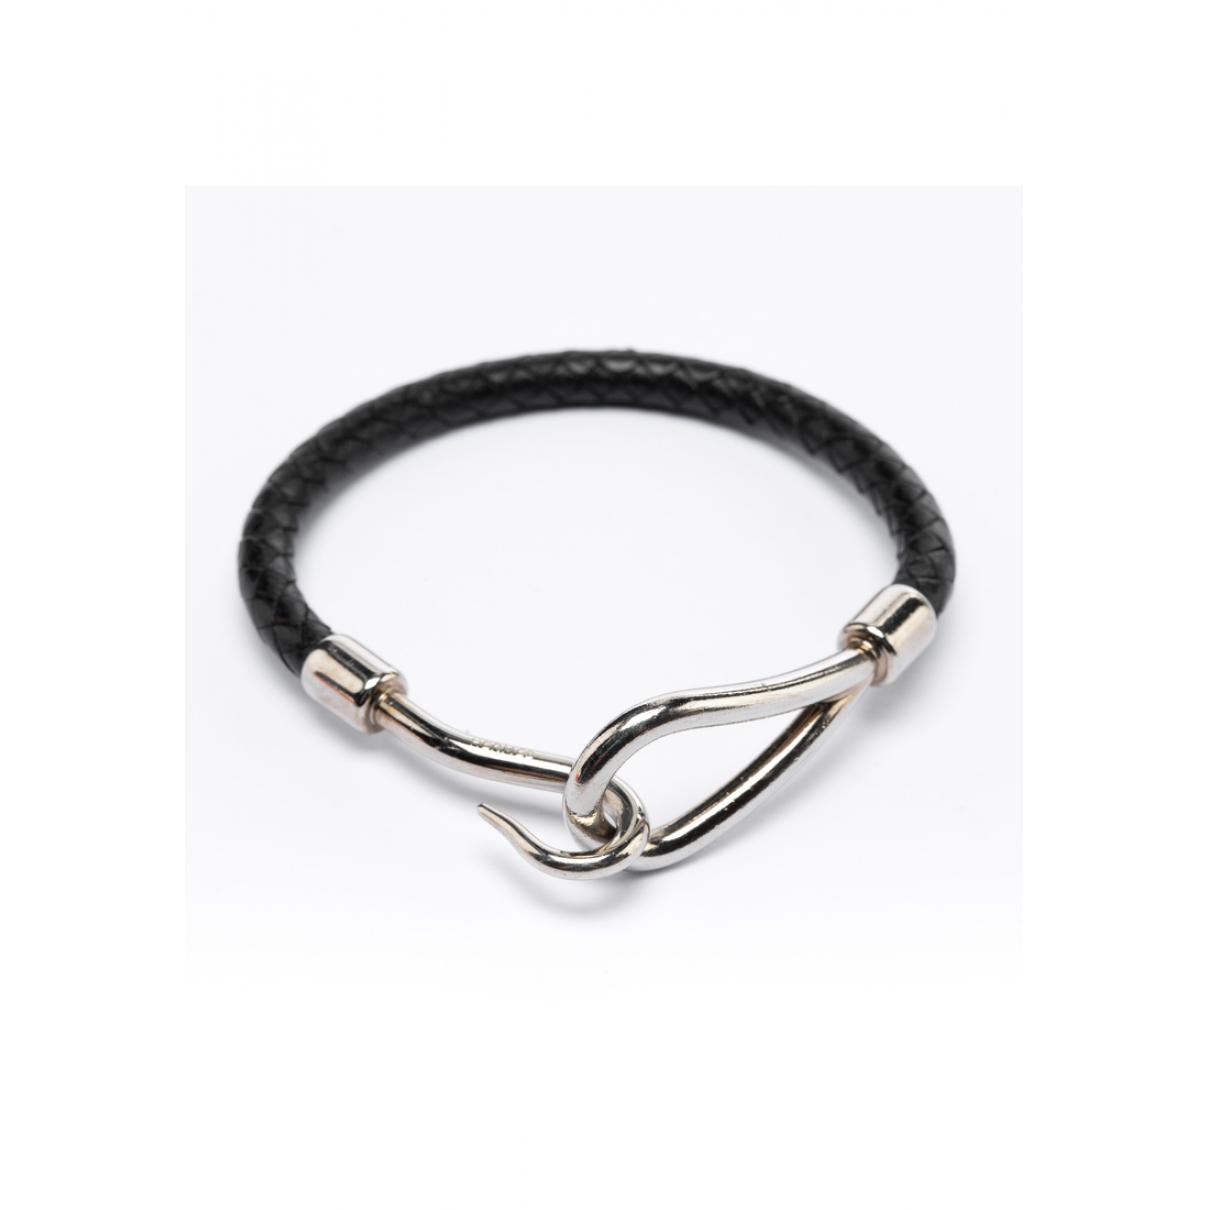 Hermes - Bracelet Jumbo pour femme en cuir - noir